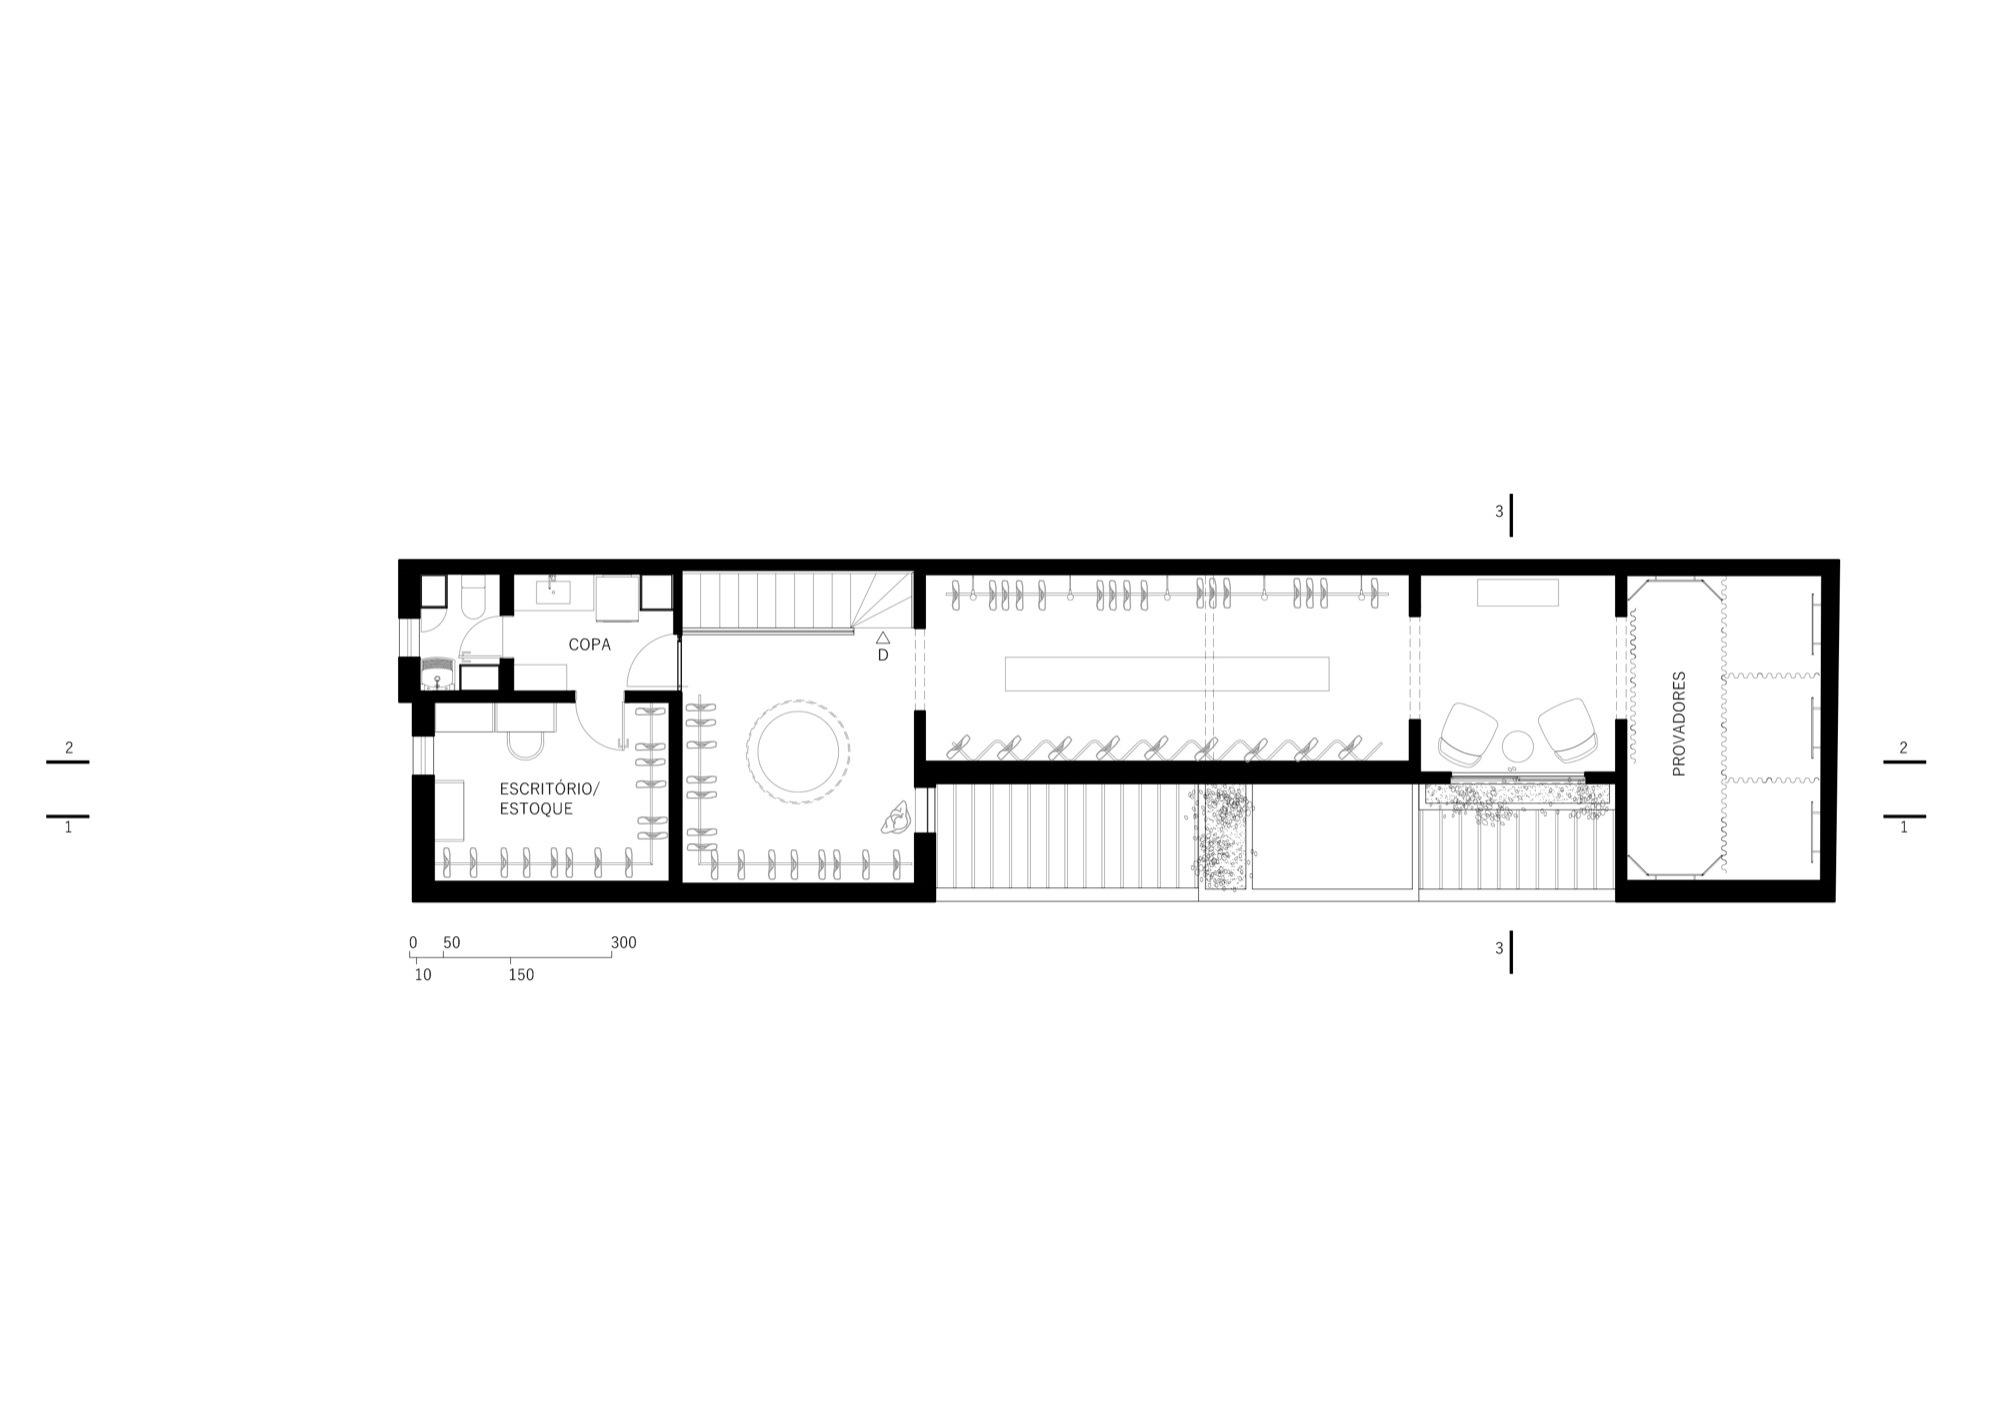 galeria de loja coven   printing    play arquitetura